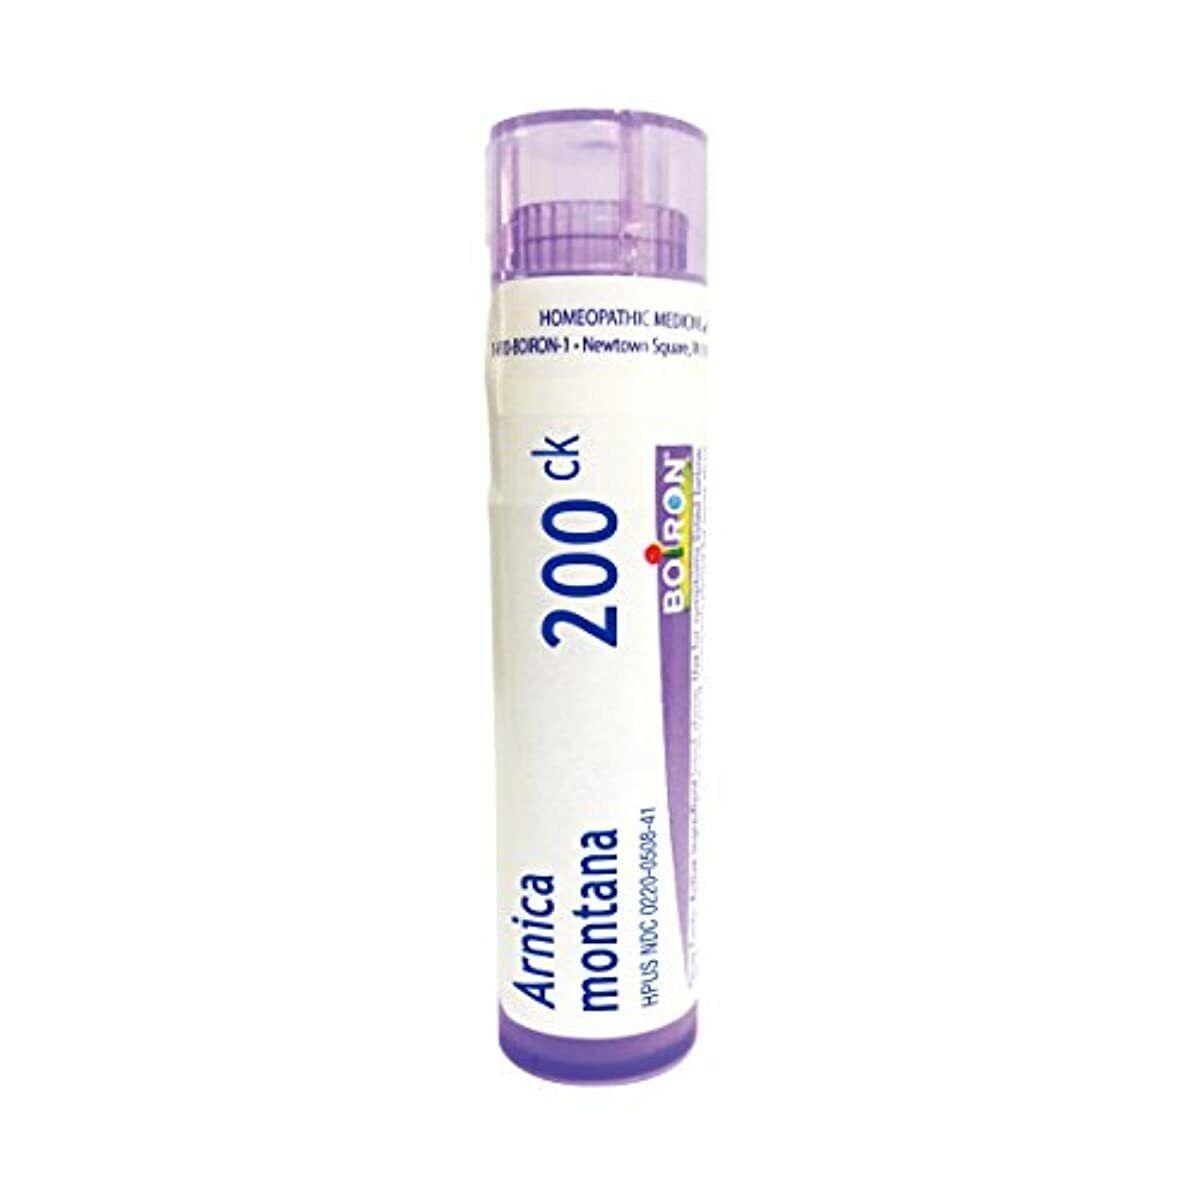 Boiron Arnica montana 200CK 80 Pellets Homeopathic Medicine